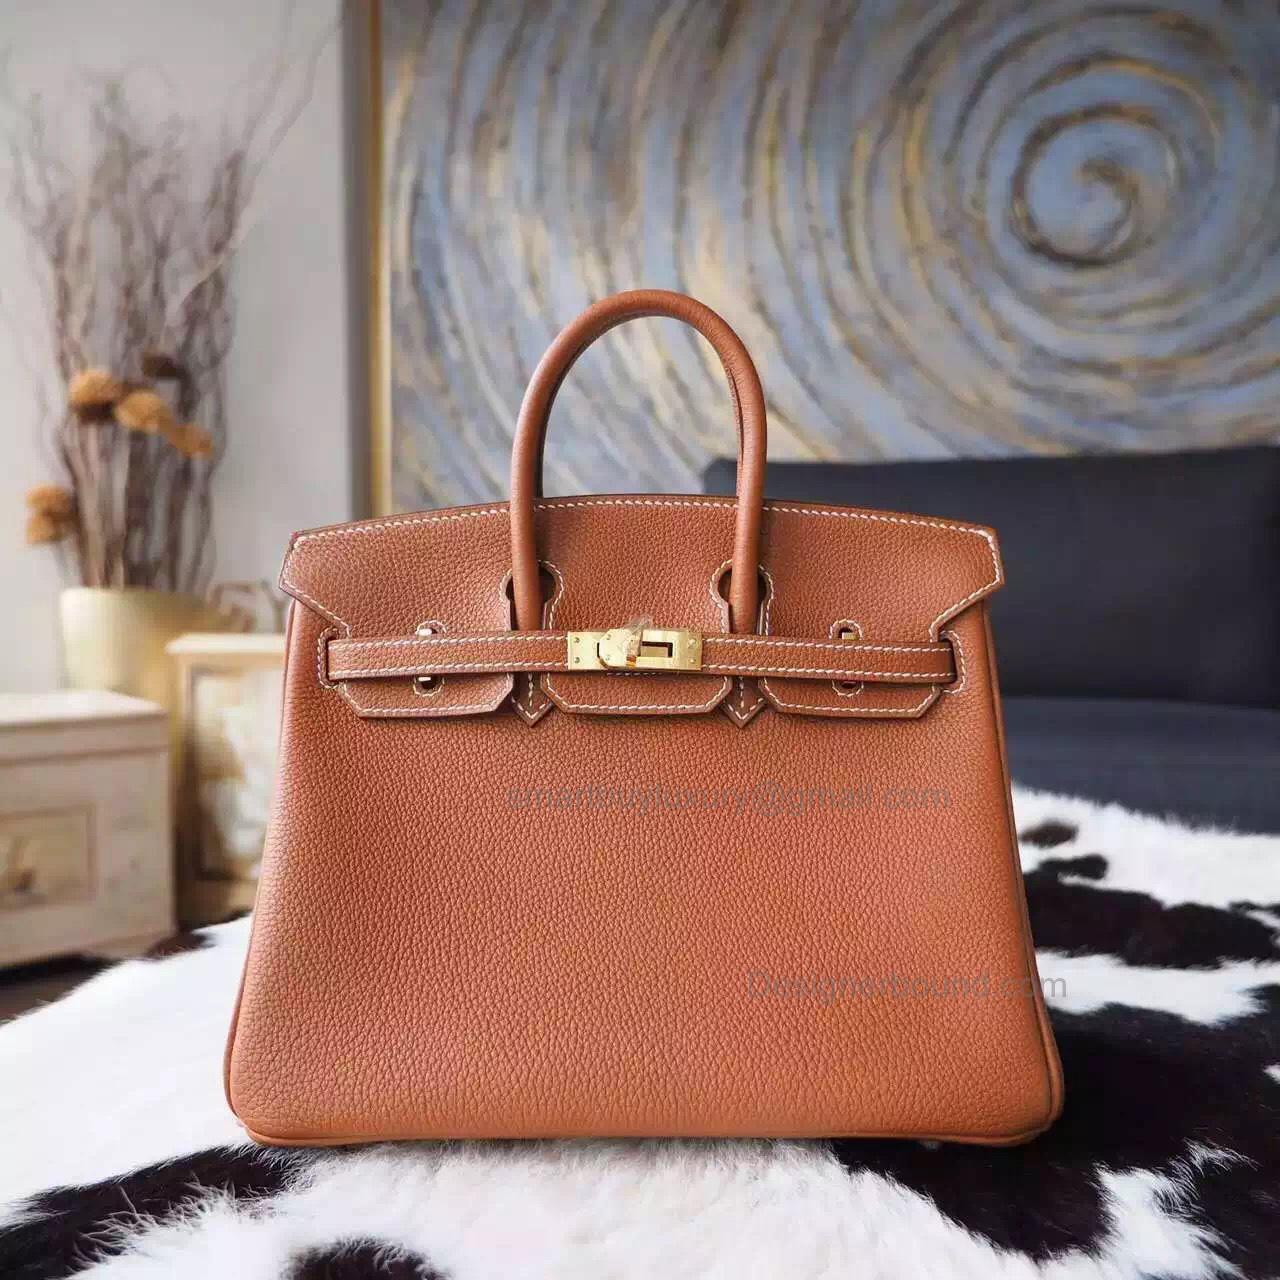 1b0eaafc39 Hand Stitched Hermes Birkin 25 Bag in cc37 Gold Togo Calfskin GHW